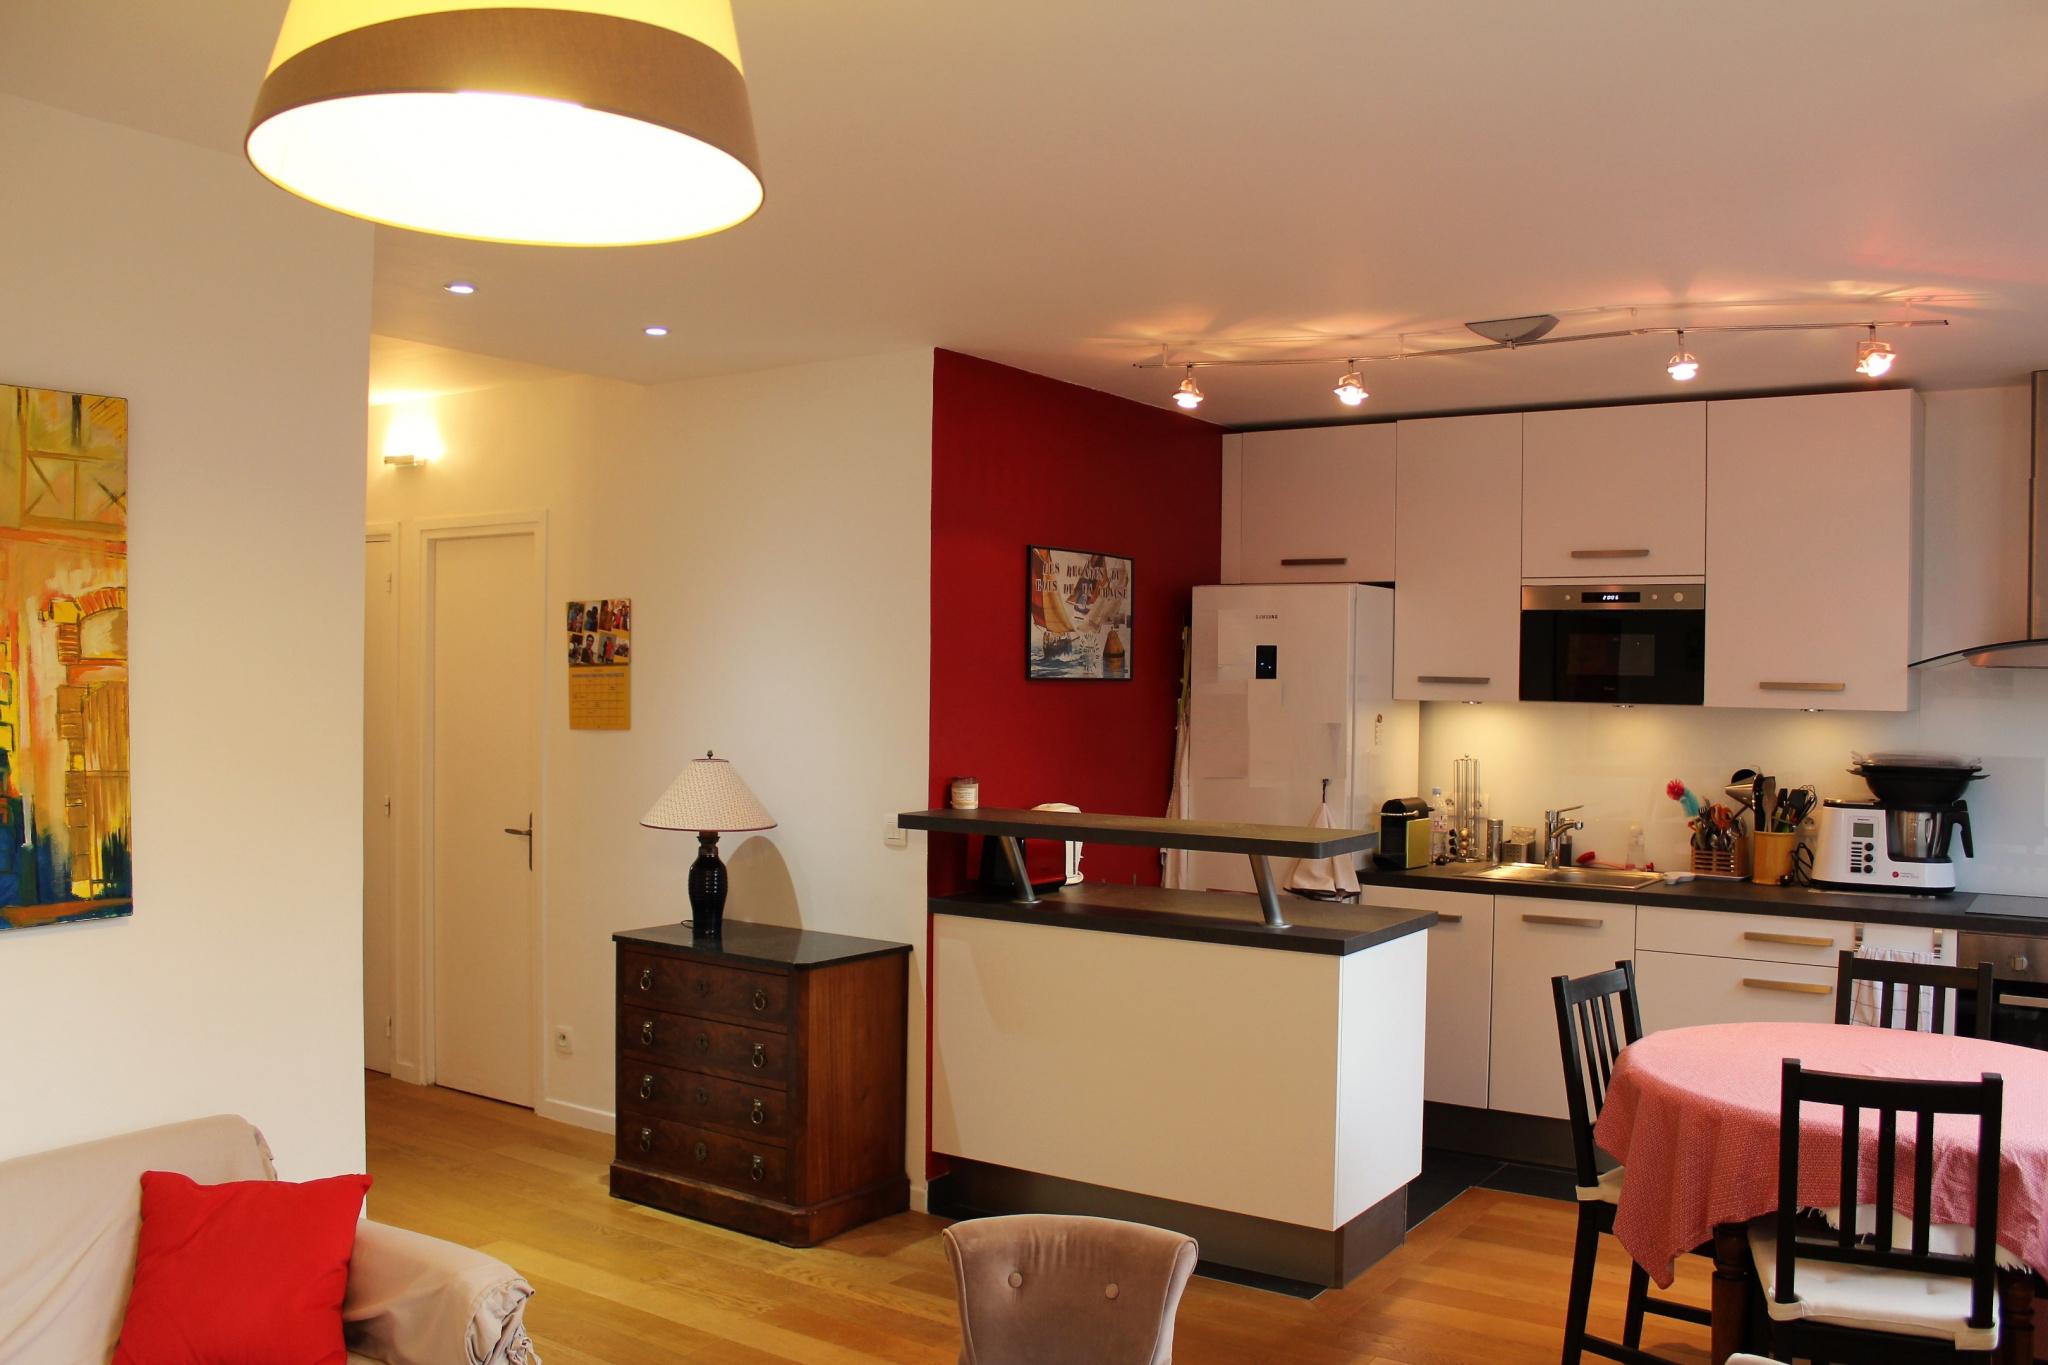 vente m tro marcel sembat 2 3 pi ces. Black Bedroom Furniture Sets. Home Design Ideas